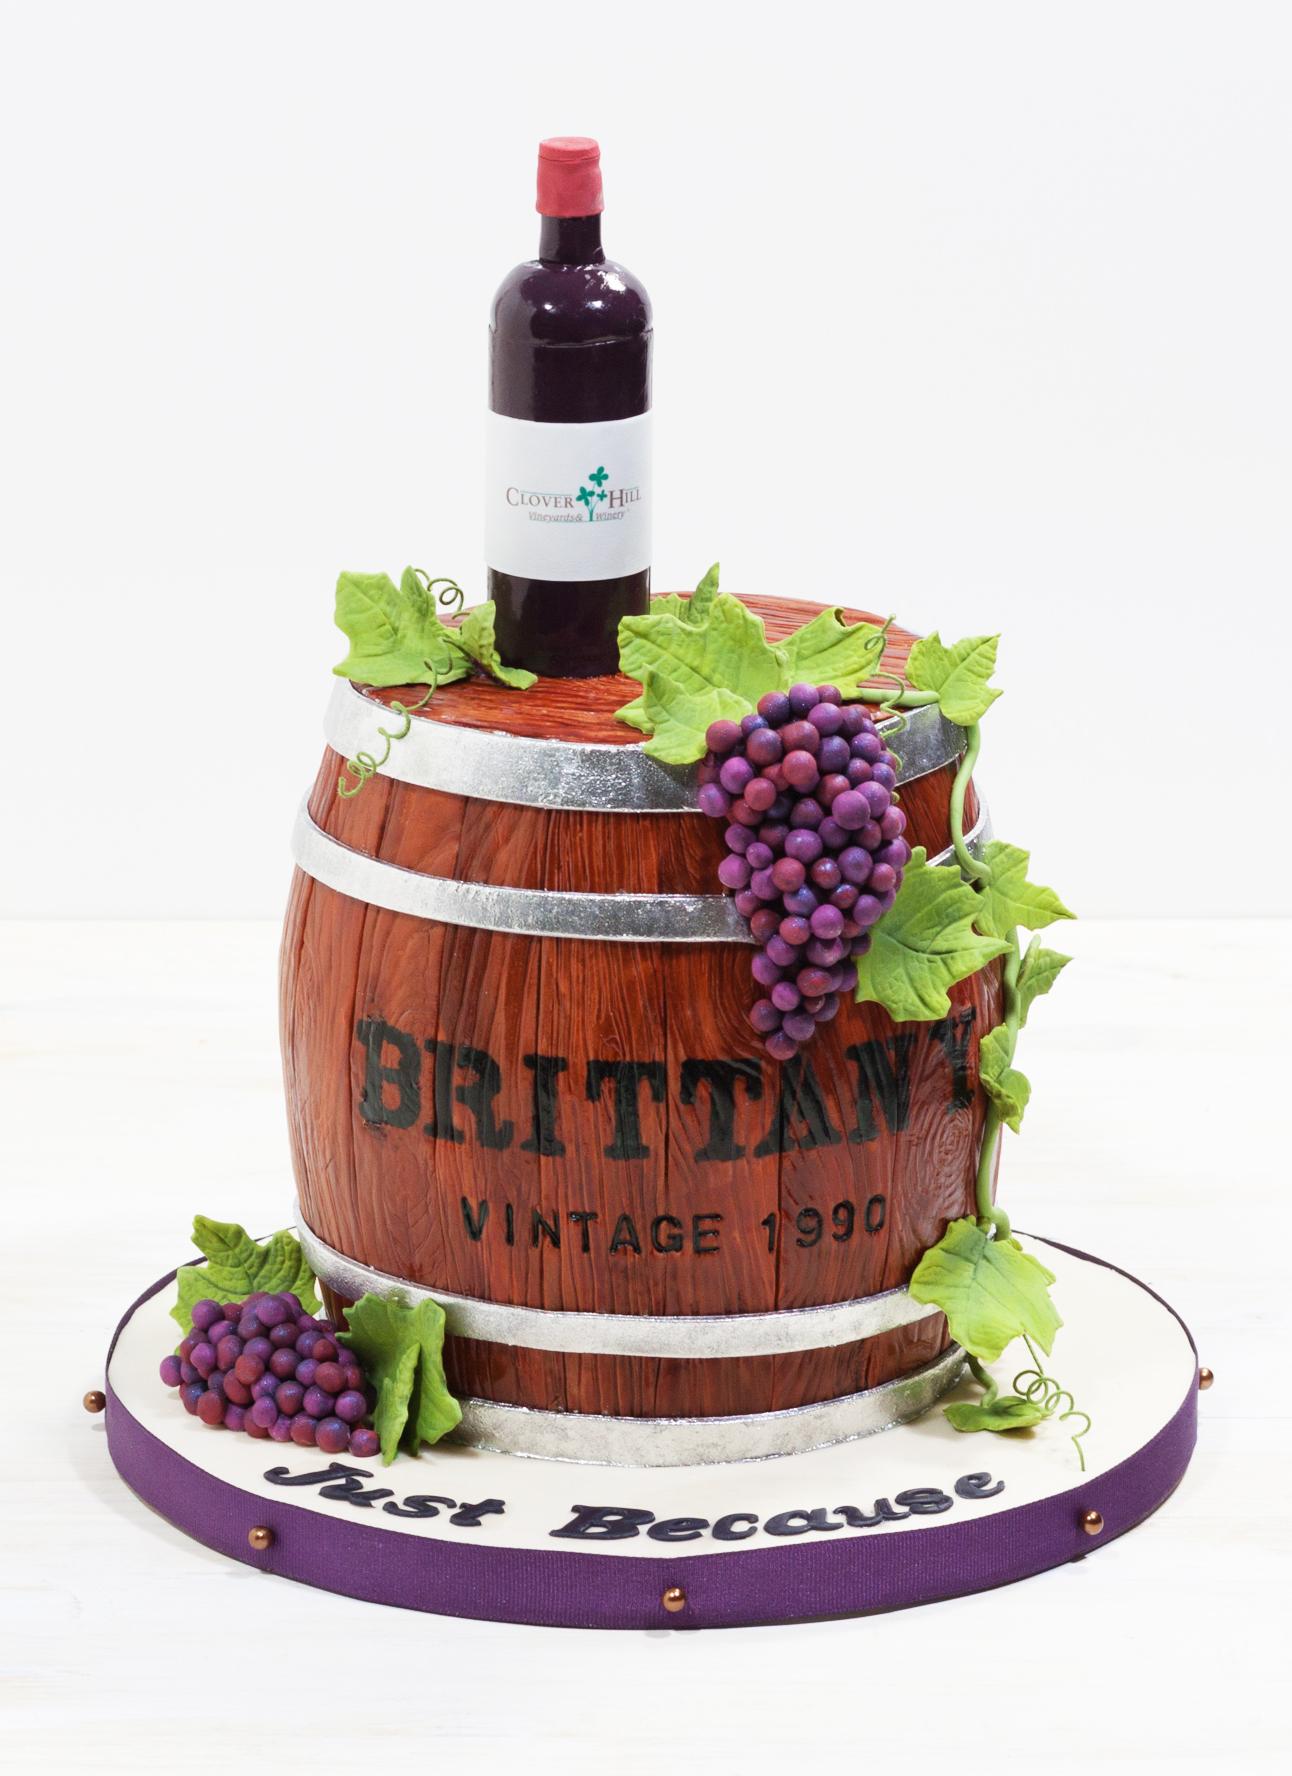 wine-barrel-cake-whipped-bakeshop